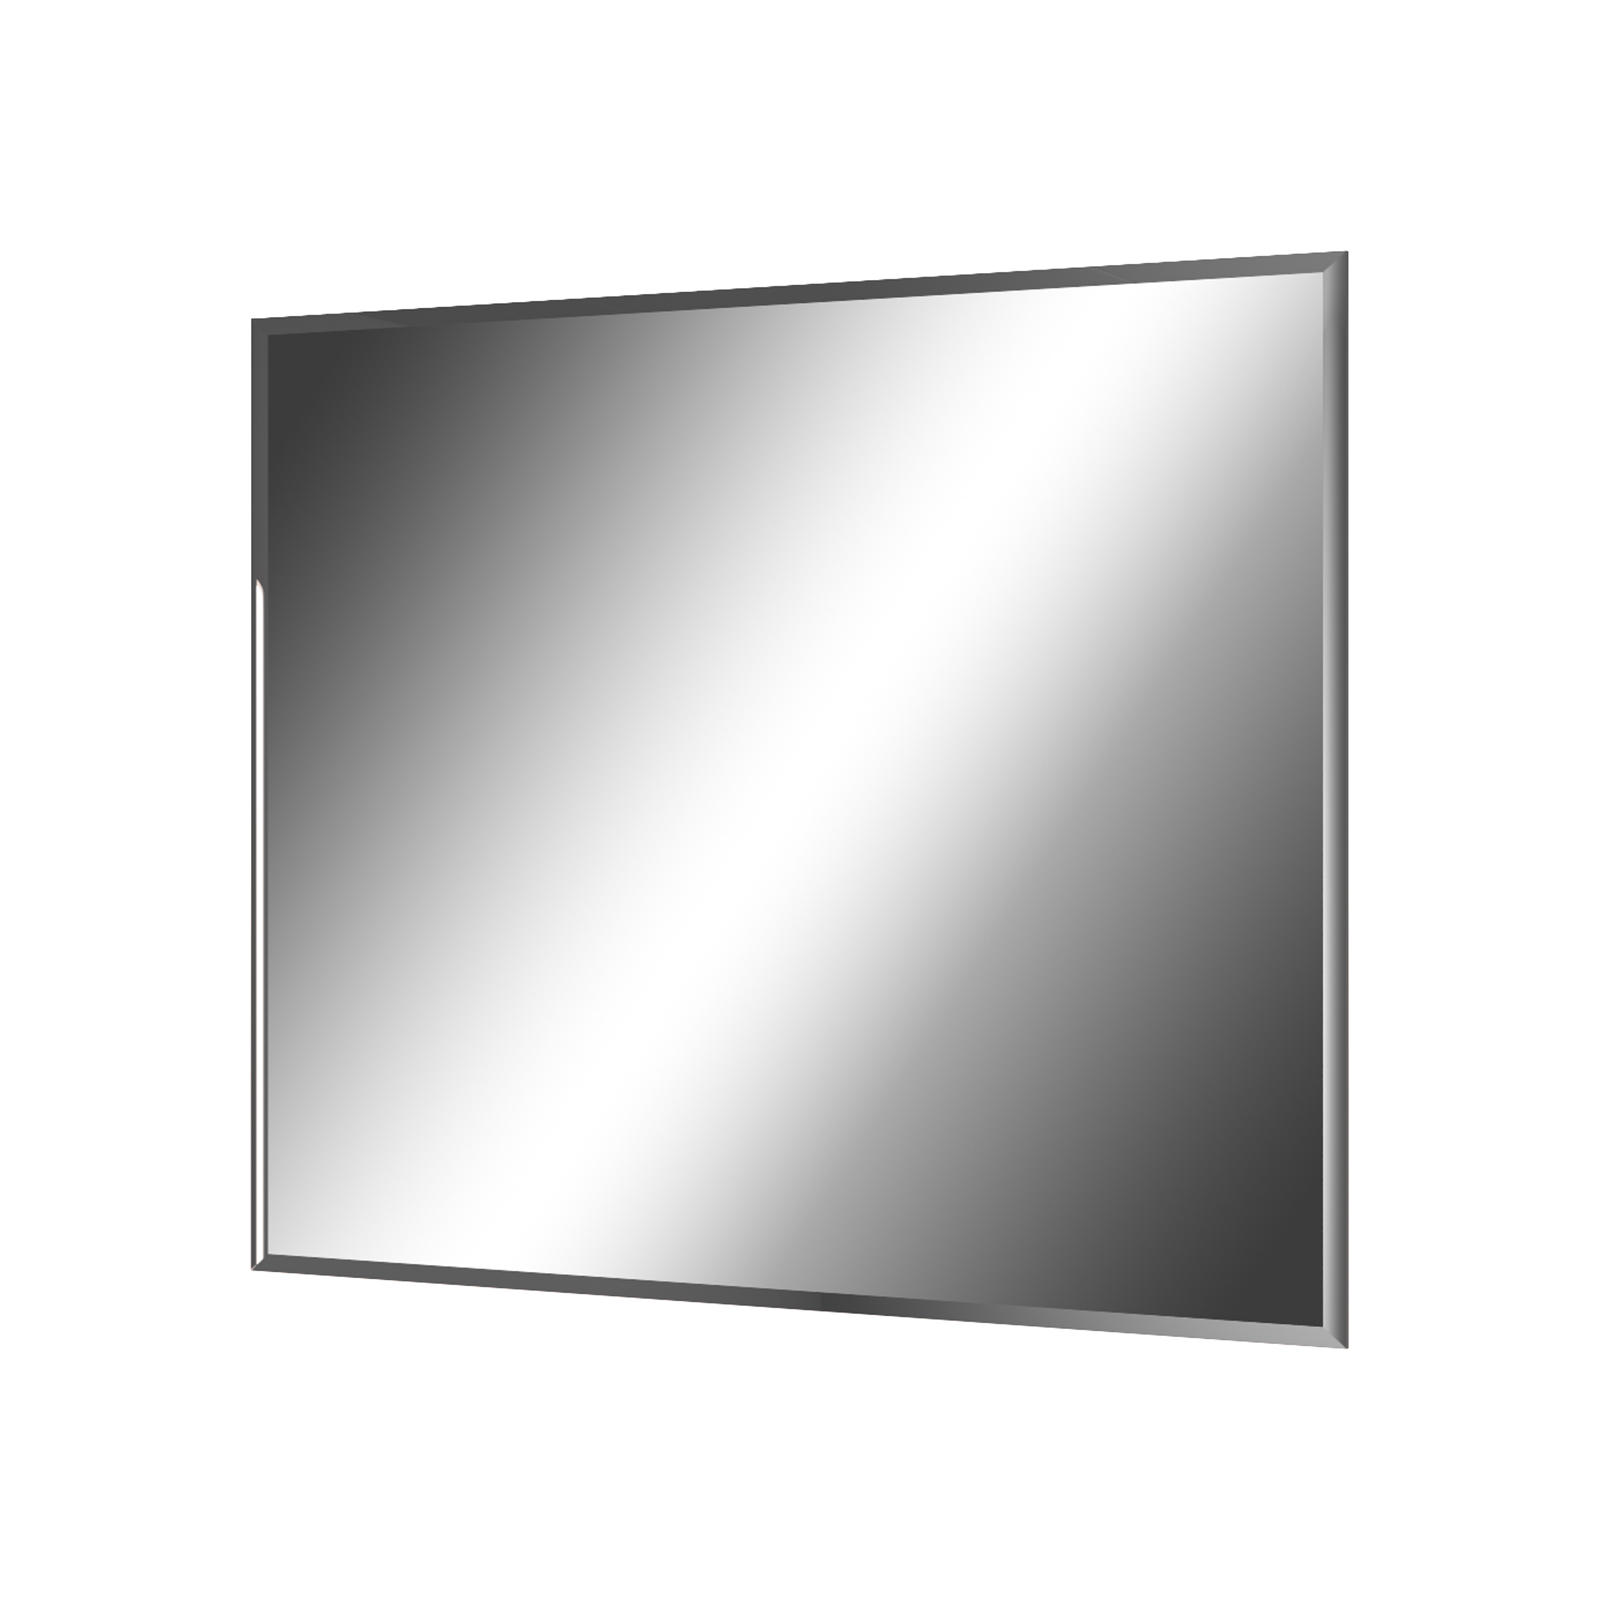 Living Elements 750 x 900 x 5mm Bevelled Edge Mirror